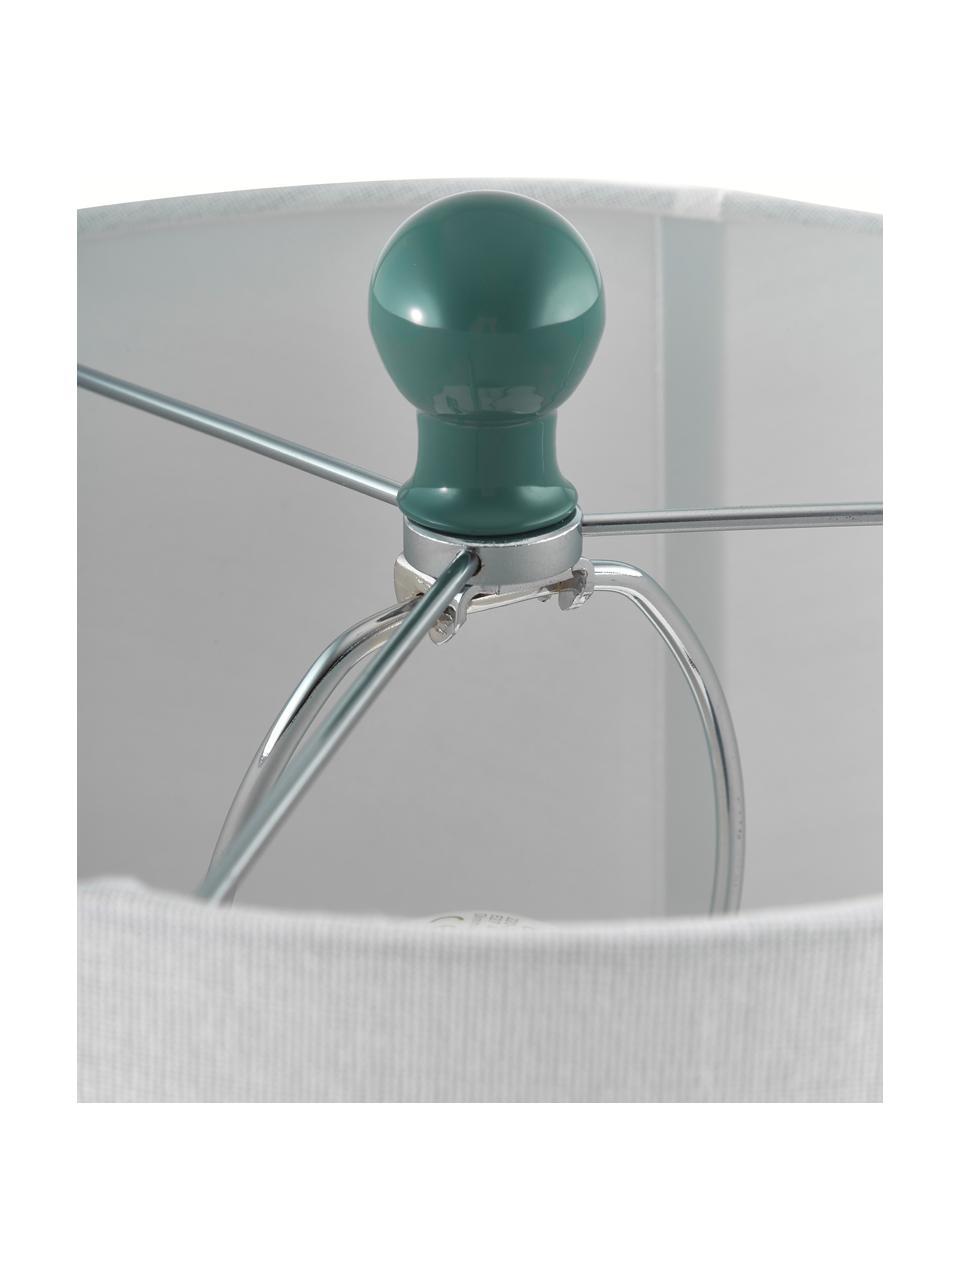 Große Tischlampen Felicitas, 2 Stück, Lampenschirm: Baumwolle, Lampenfuß: Glas, lackiert, Sockel: Metall, Grün, Ø 35 x H 58 cm